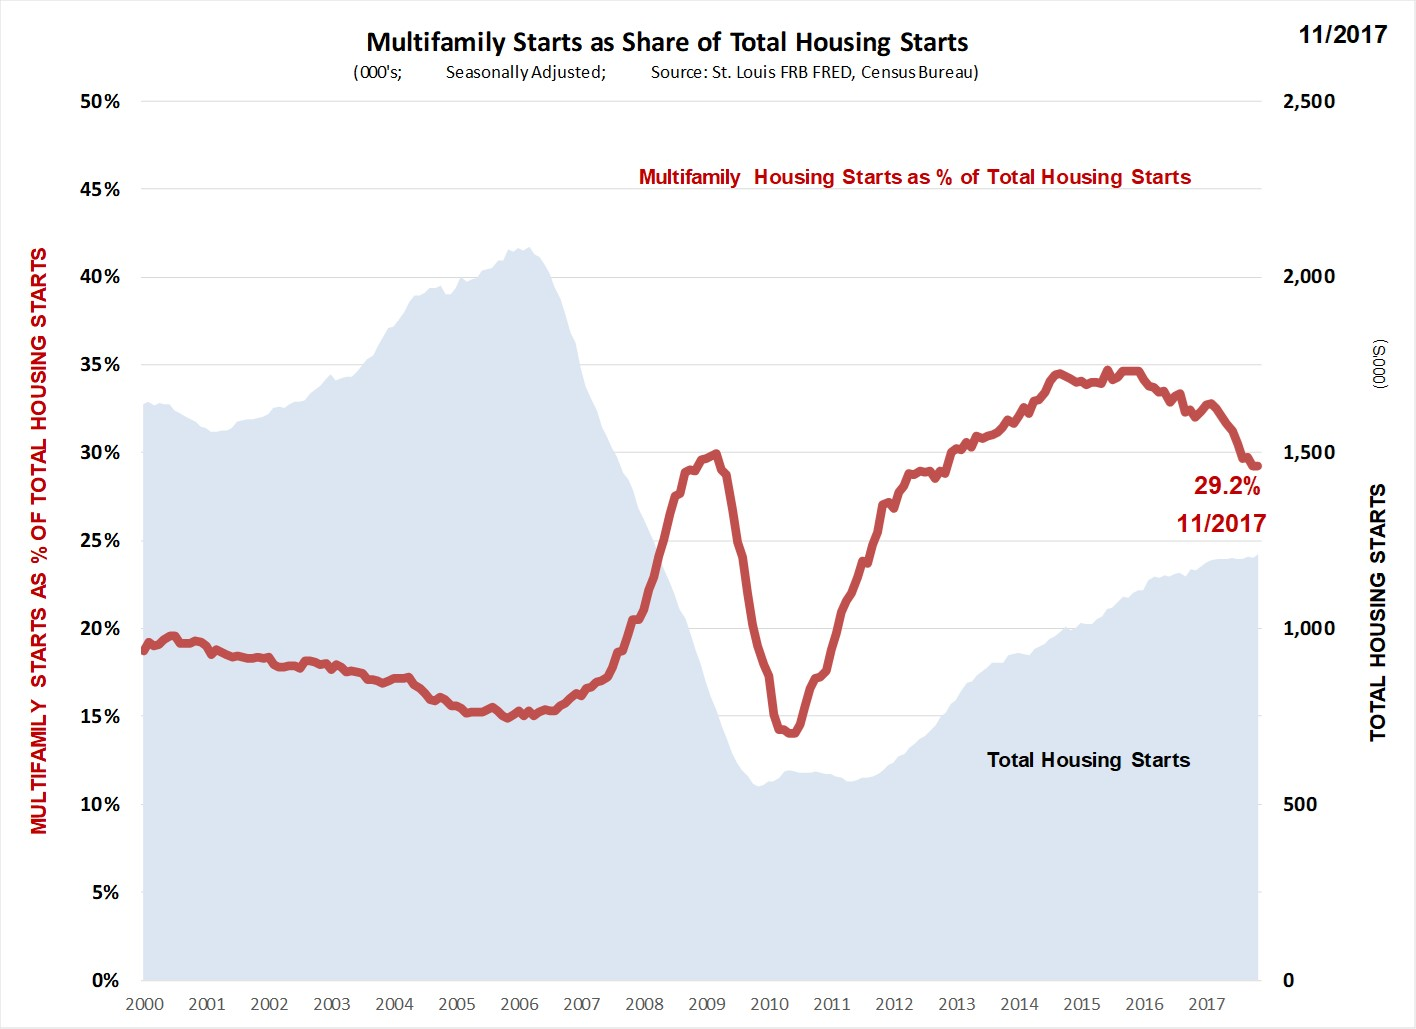 Housing_Starts_MF_PCT.jpg